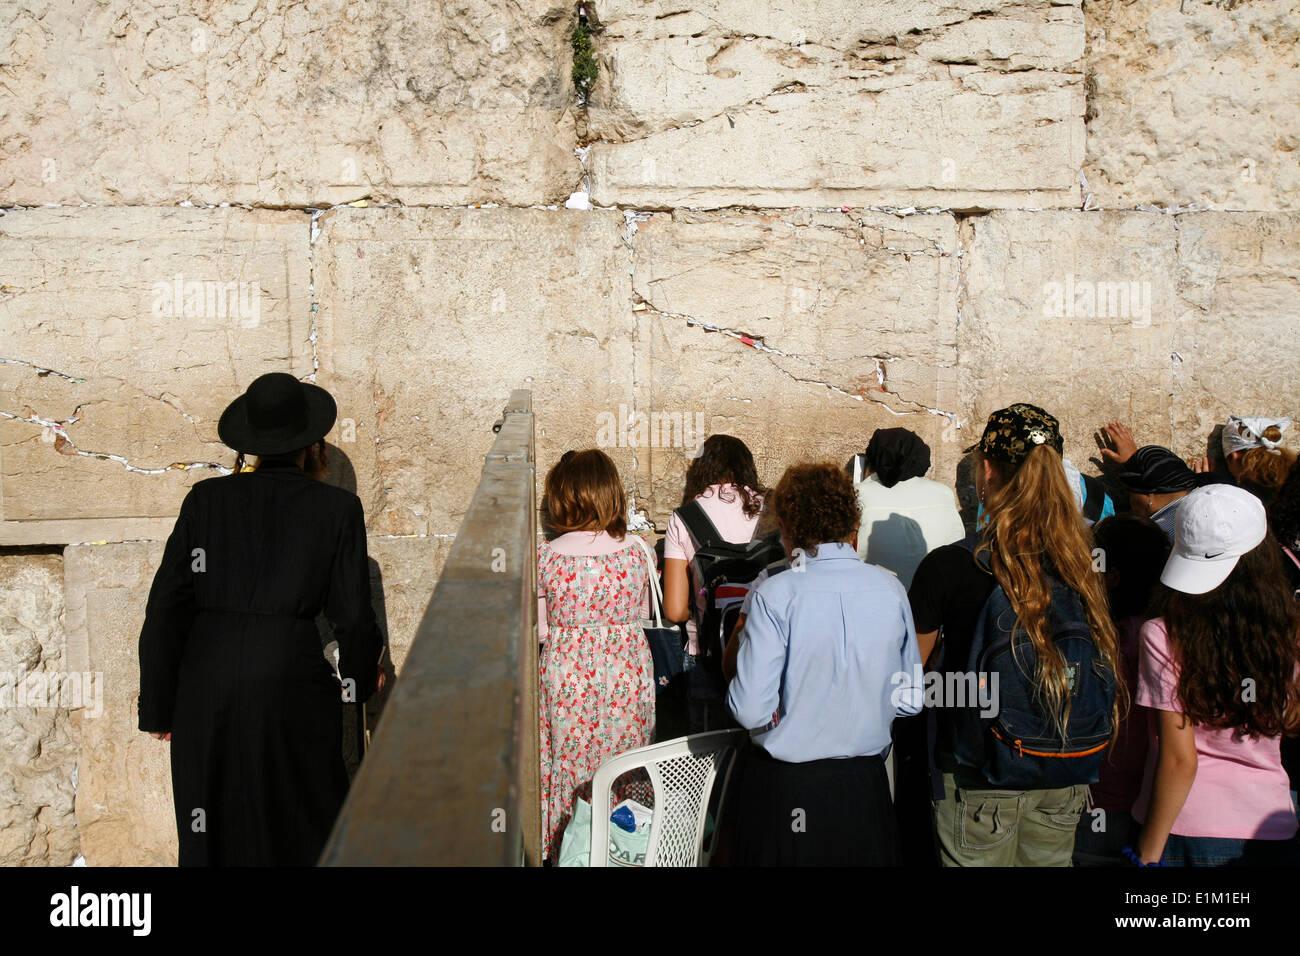 Man and Women Praying separately at Western Wall - Stock Image